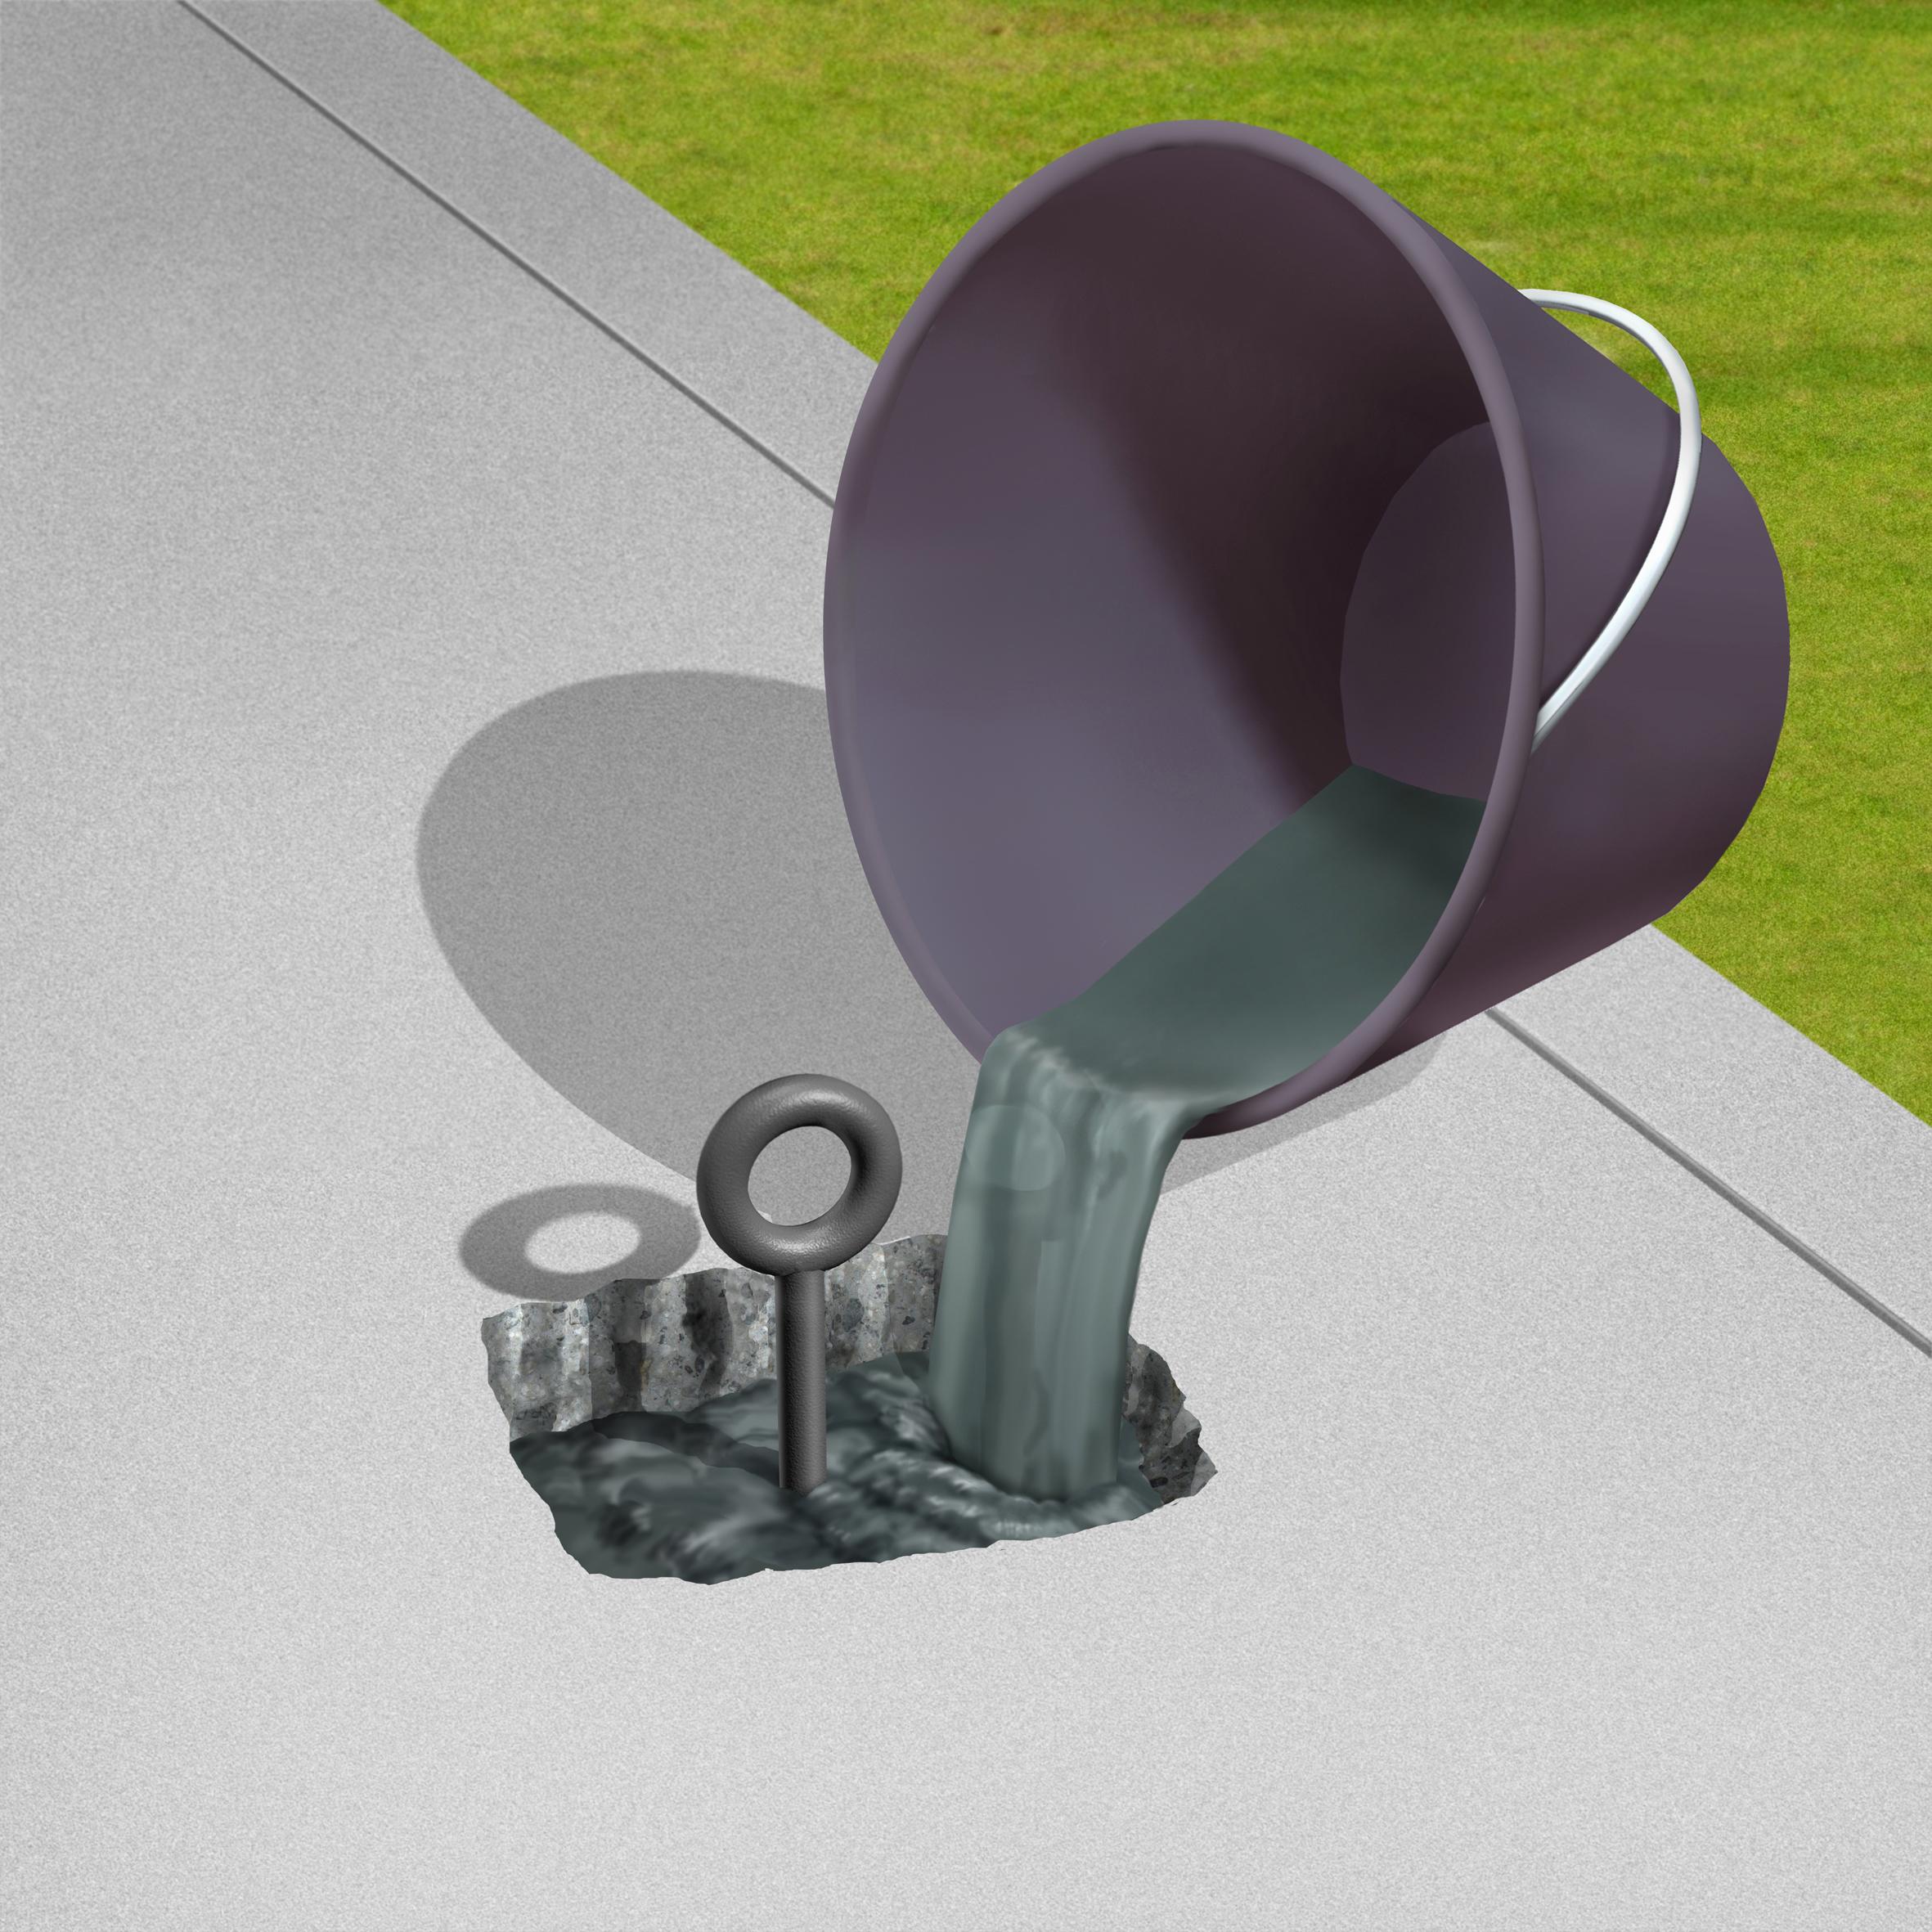 Mortare expandabile de inalta performanta - Produse si aplicatii SIKA - Poza 2